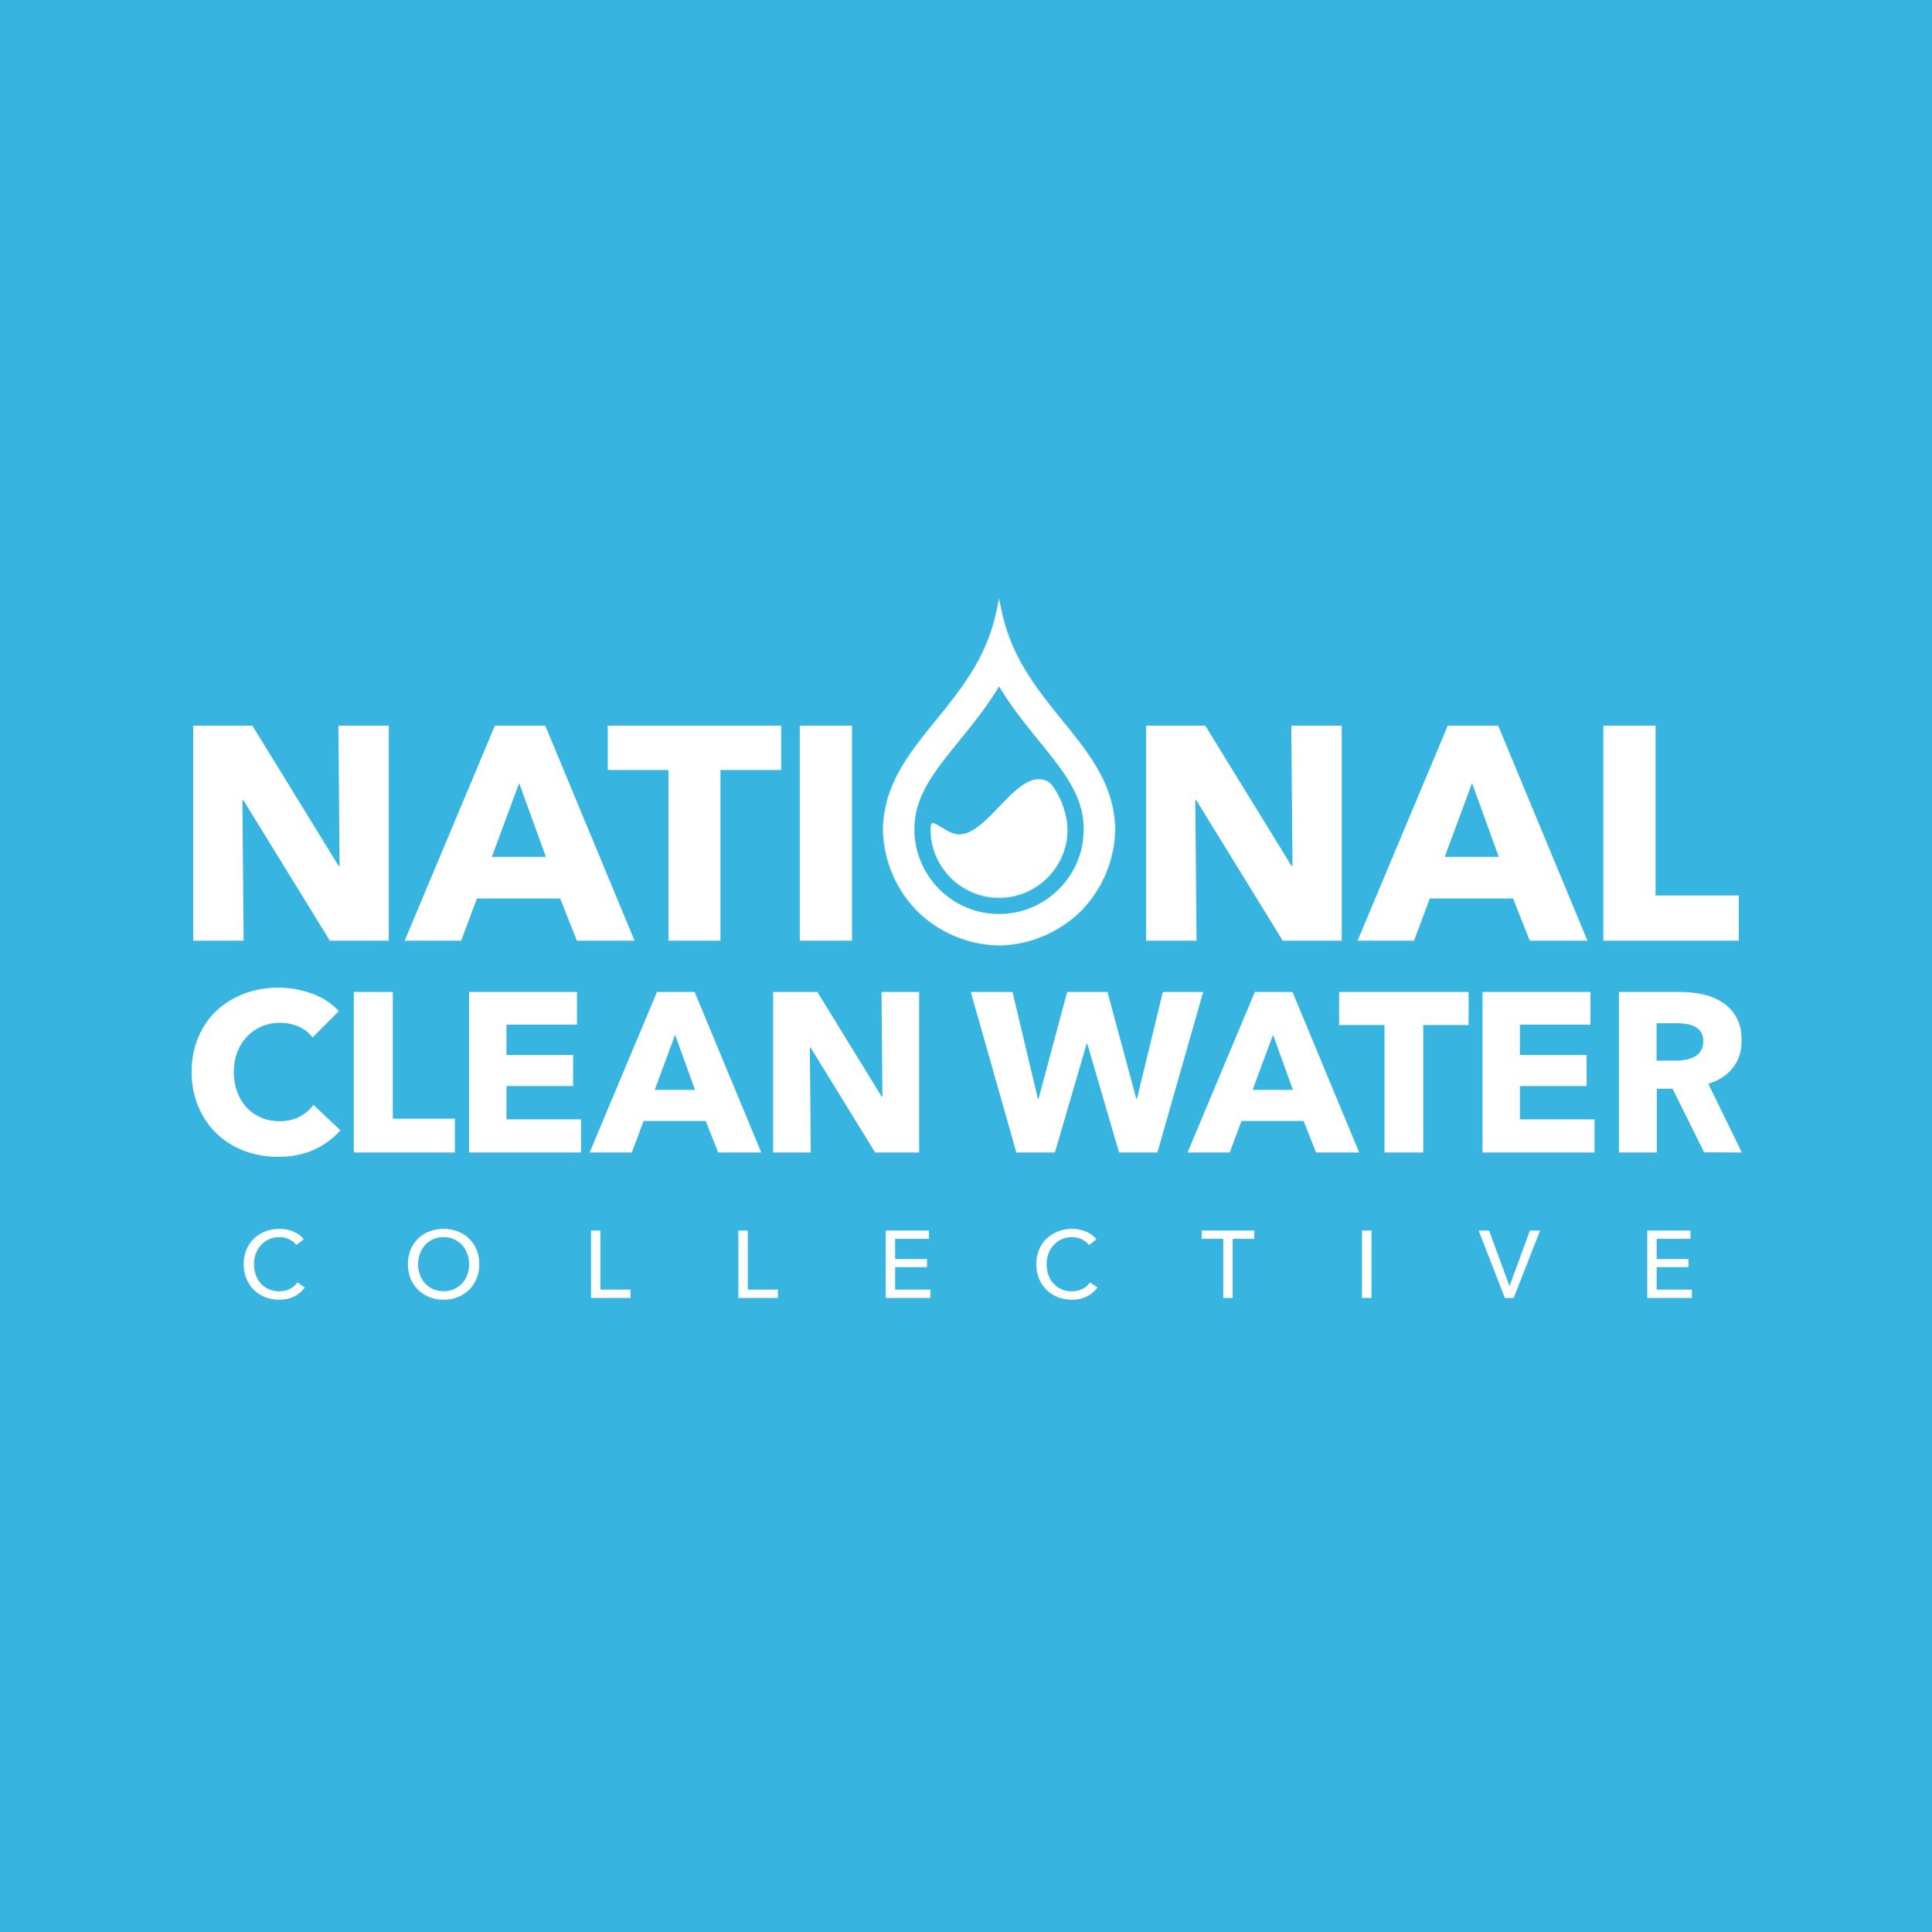 National Clean Water - Wordmark & Symbol Designnon-Profit Grassroots Organizationserving The Flint, Michigan Community